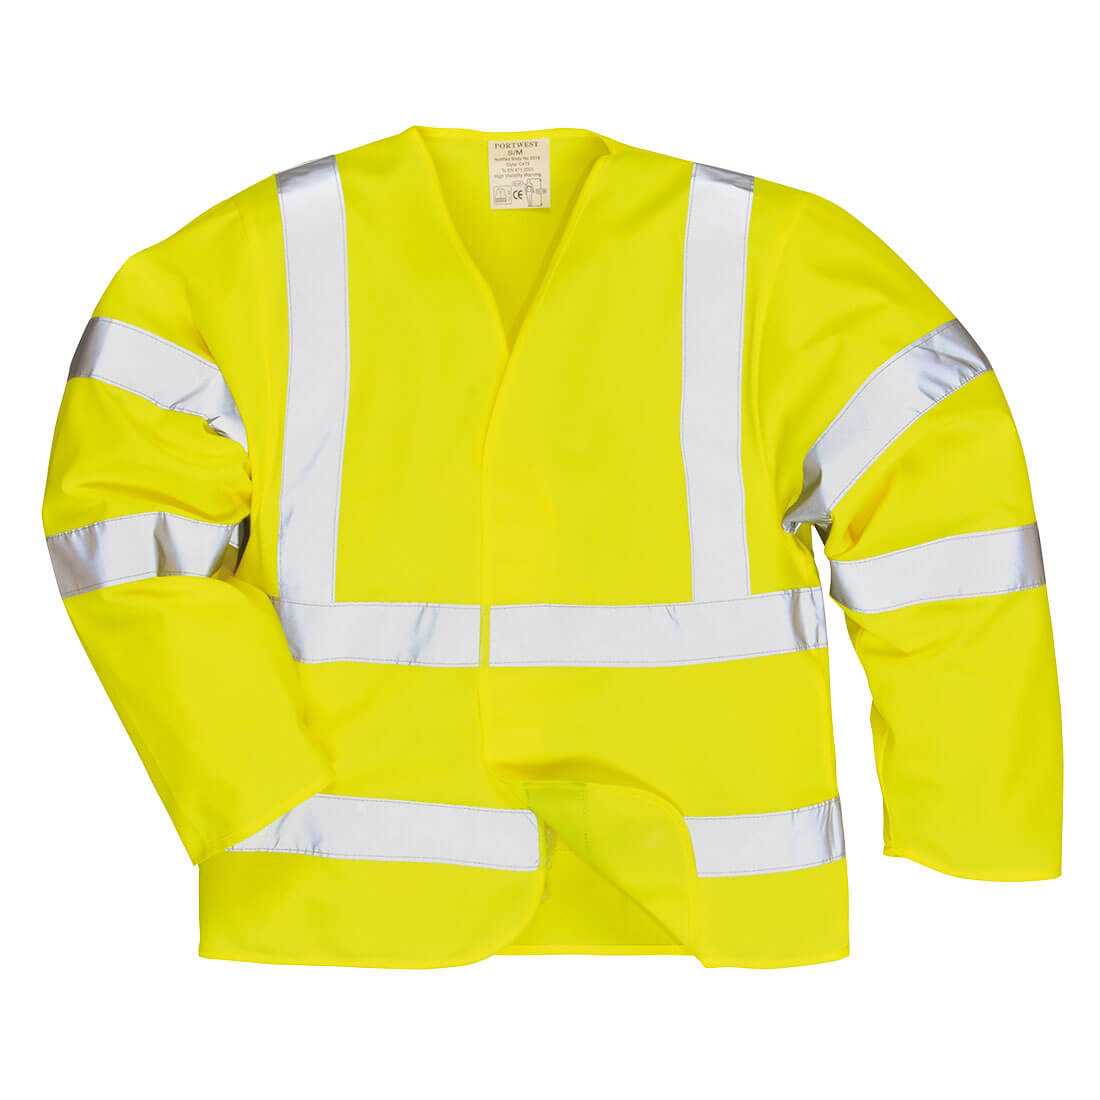 Image of Biz Flame Class 3 Hi Vis Anti Static Flame Resistant Jacket Yellow 2XL / 3XL